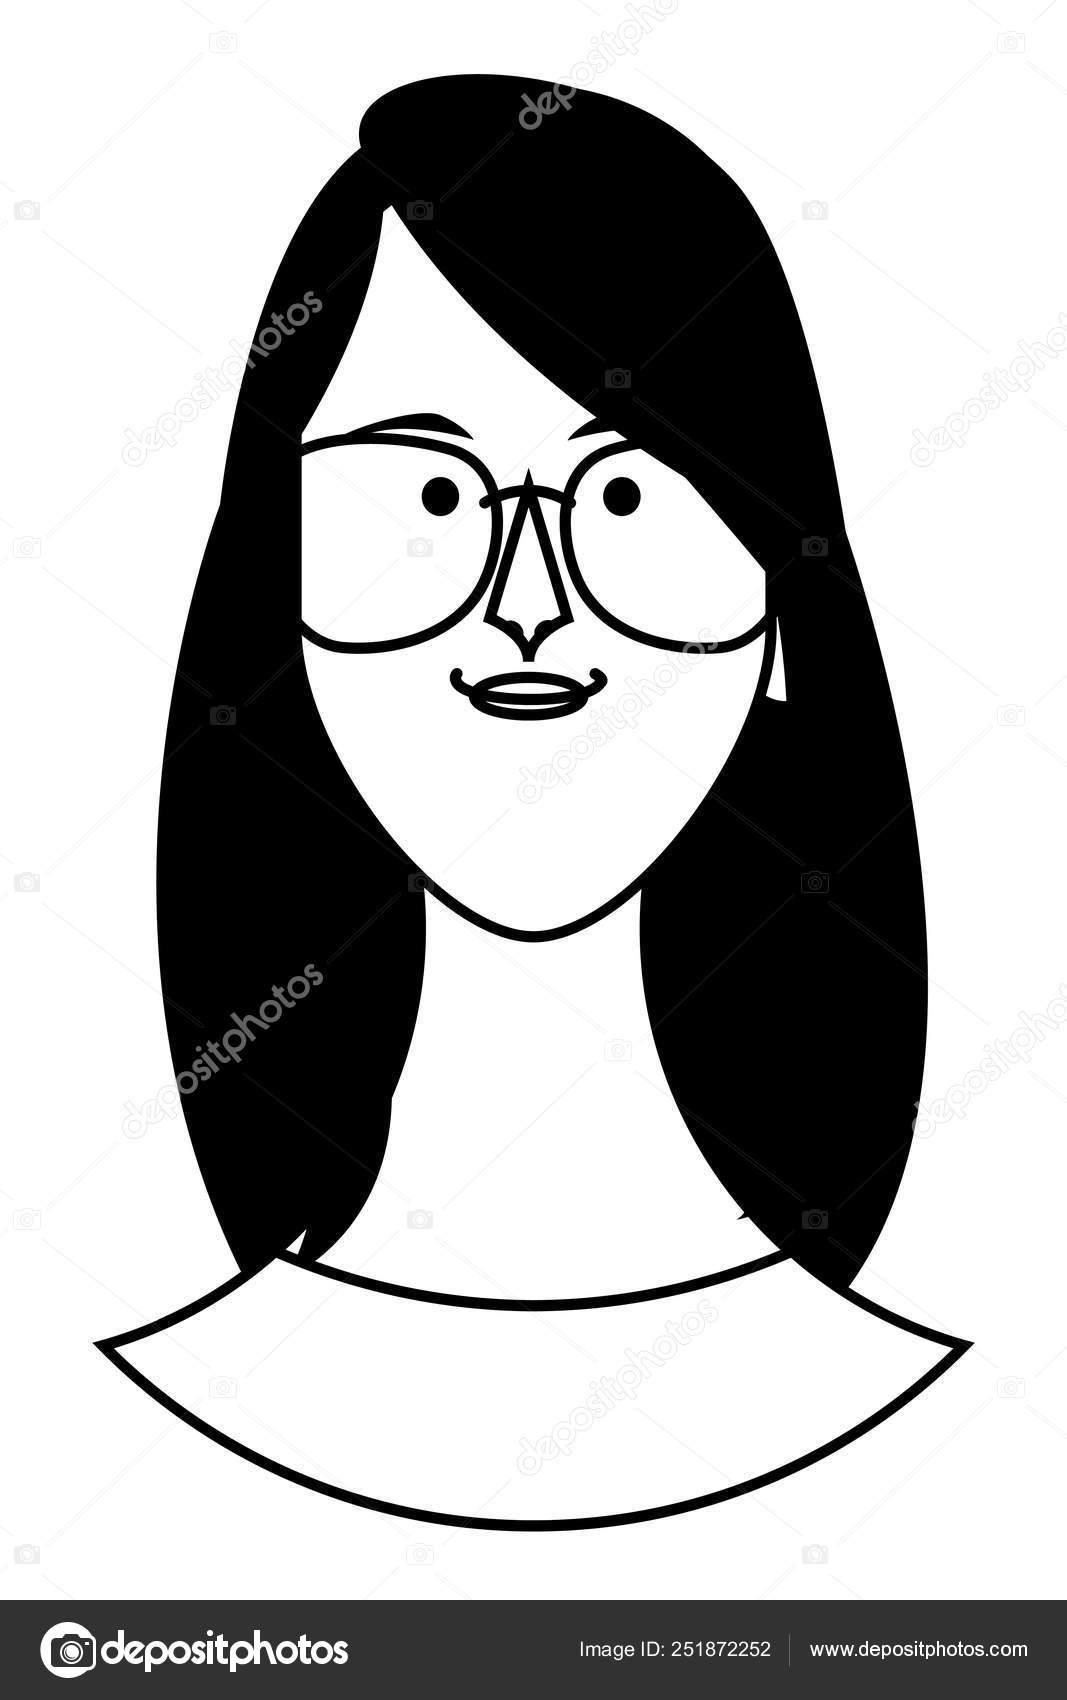 Woman Face Cartoon In Black And White Stock Vector C Jemastock